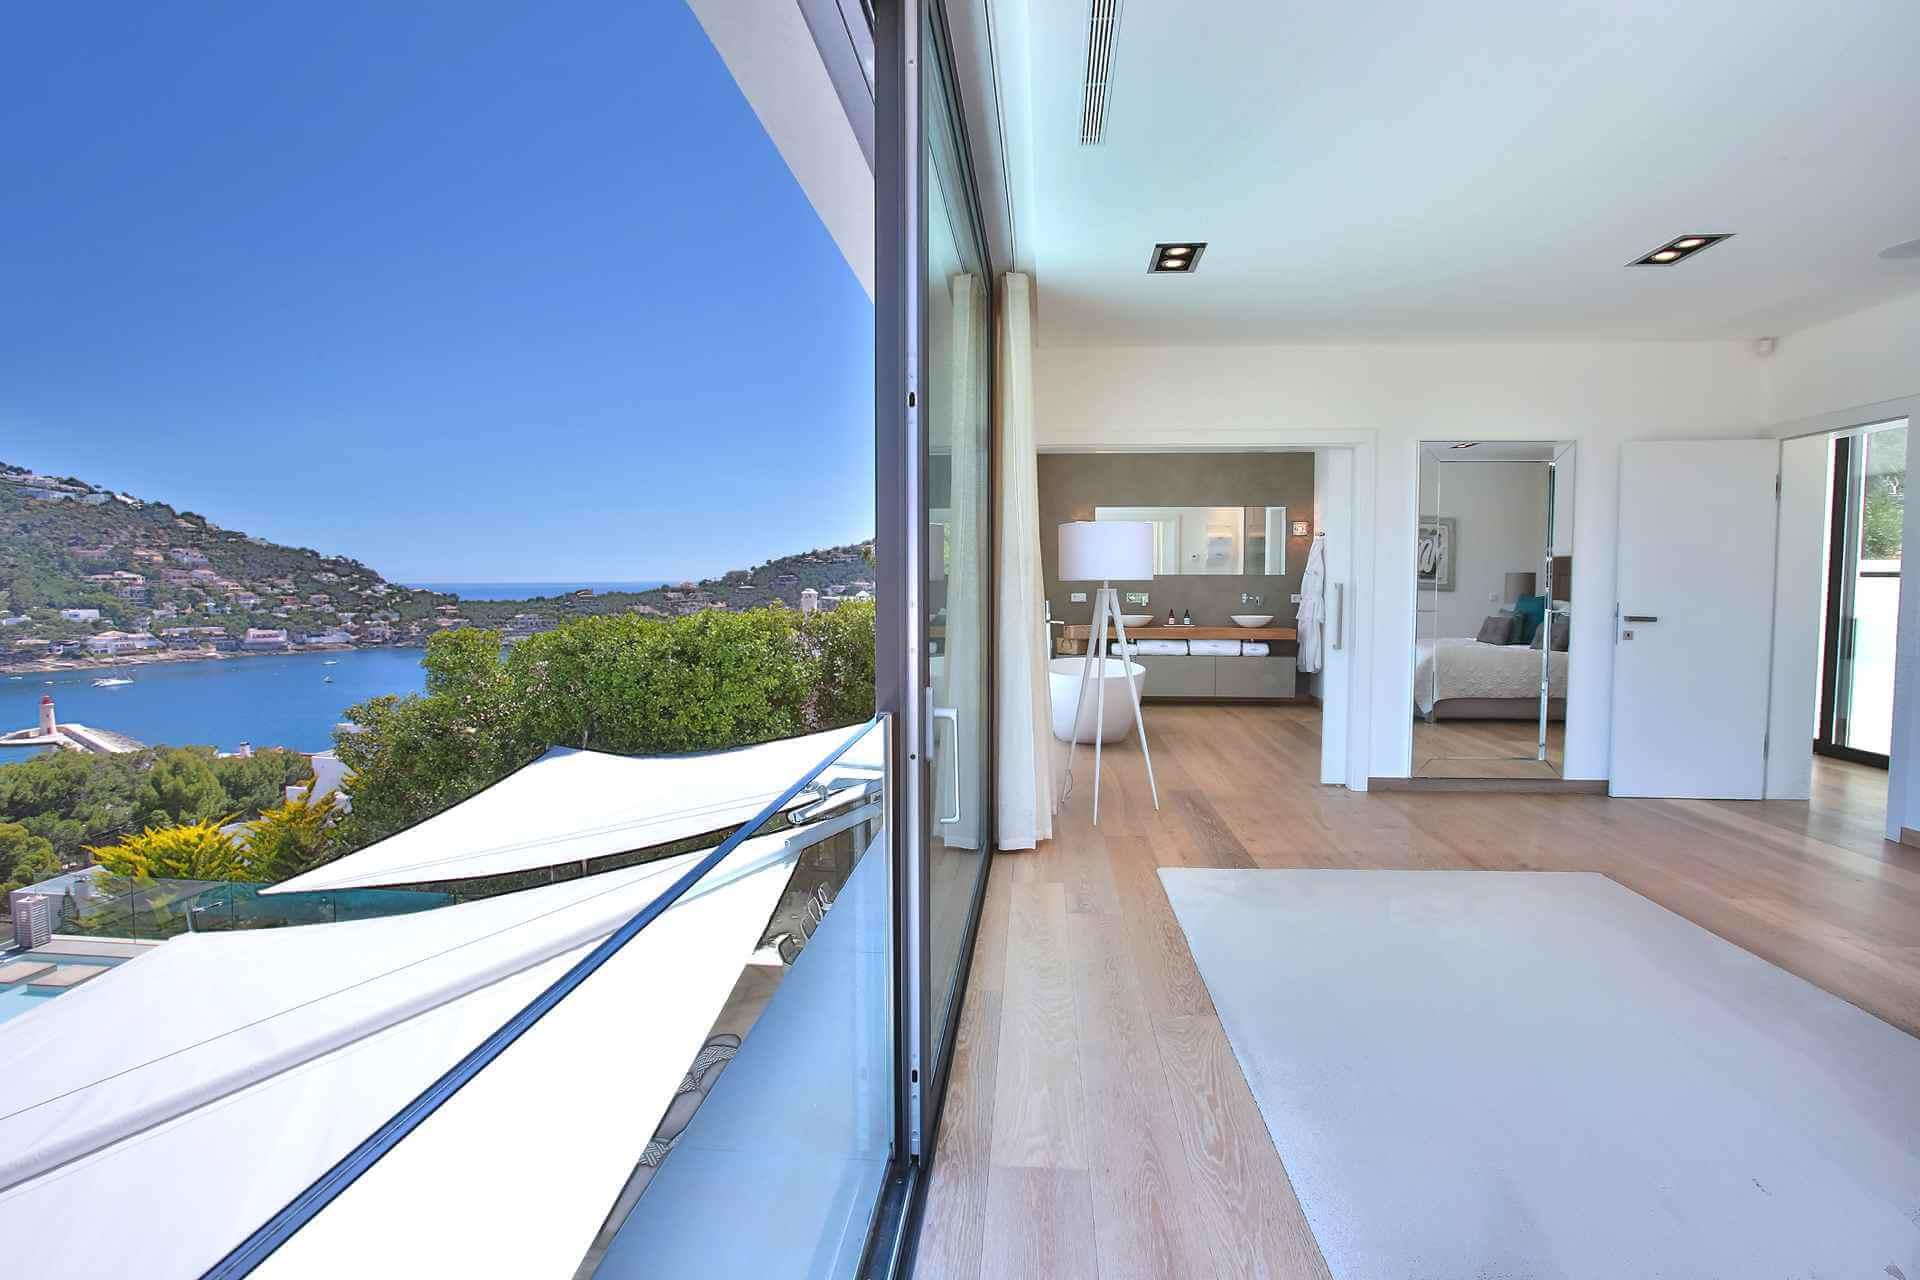 01-353 Villa with indoor pool Mallorca Southwest Bild 16